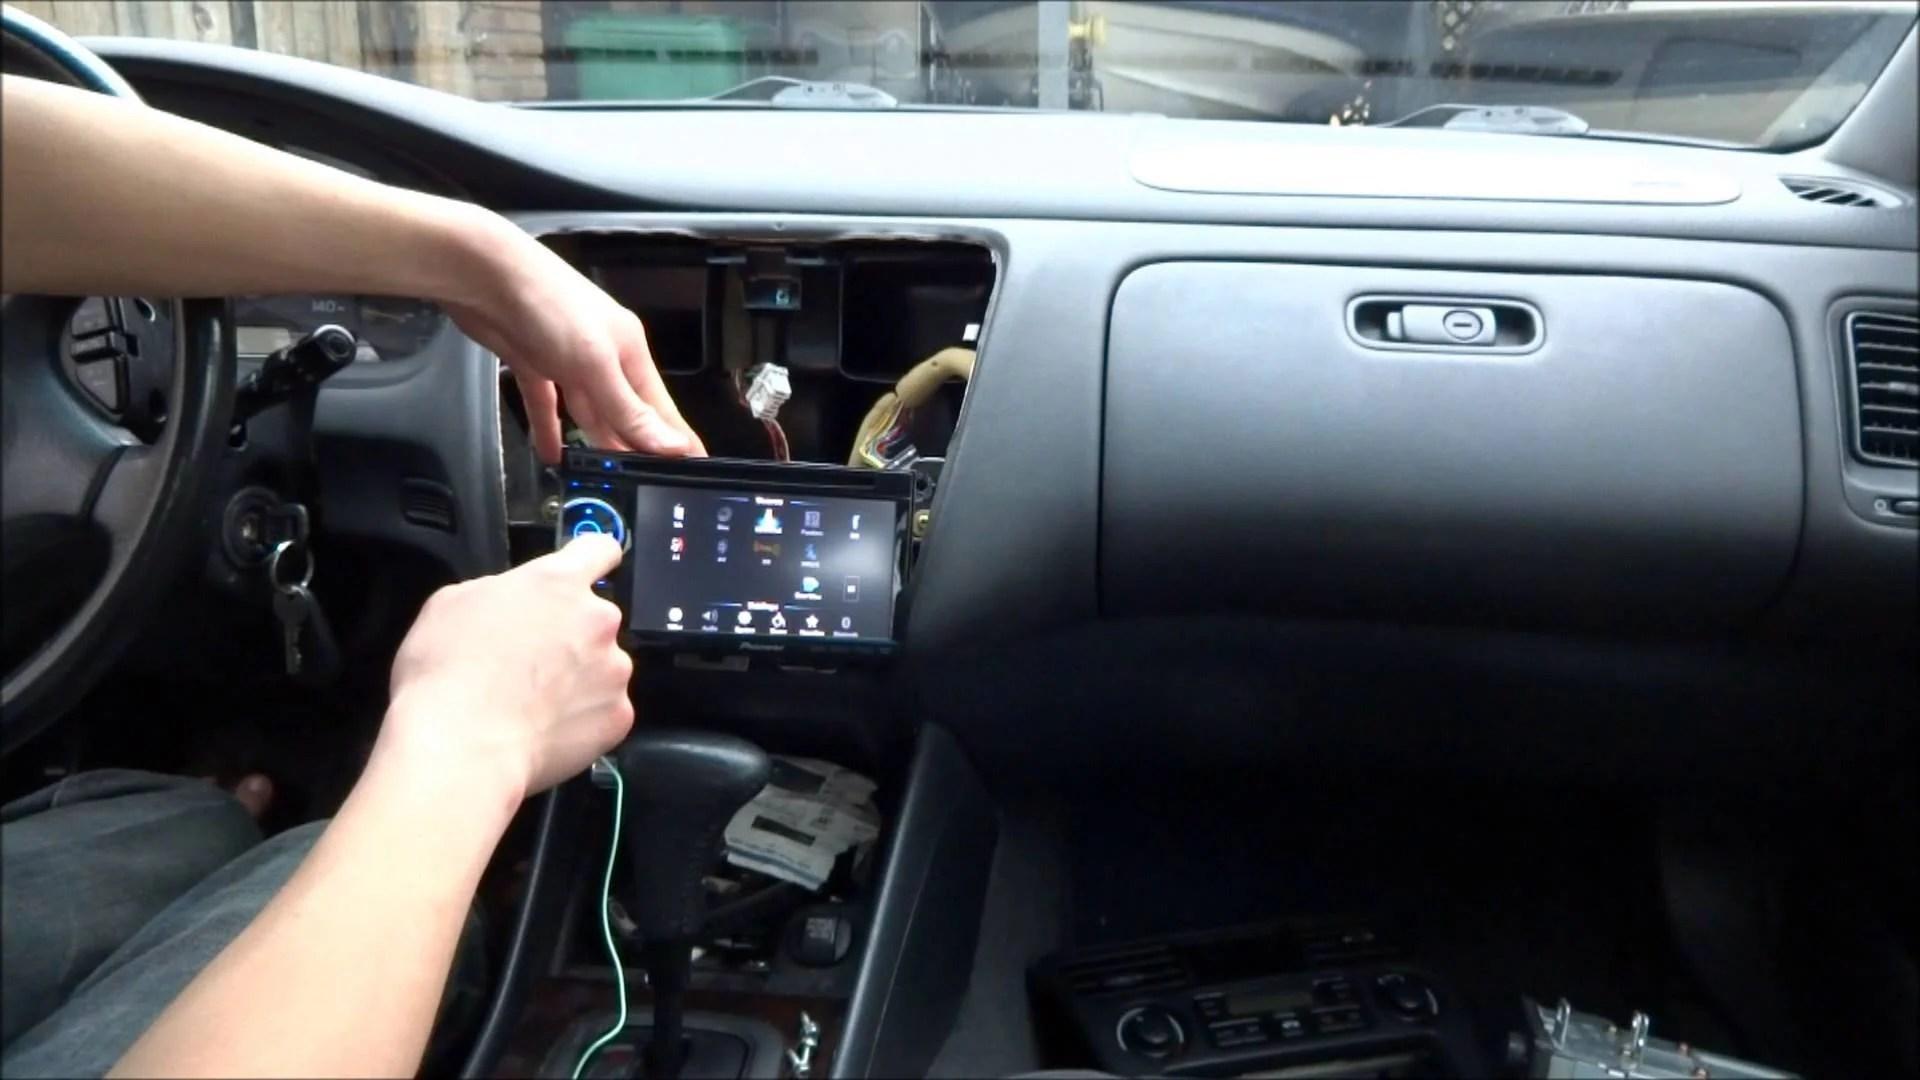 2003 Jaguar Xj8 Fuse Box Diagram Car Audio Installation Toronto Lockdown Security